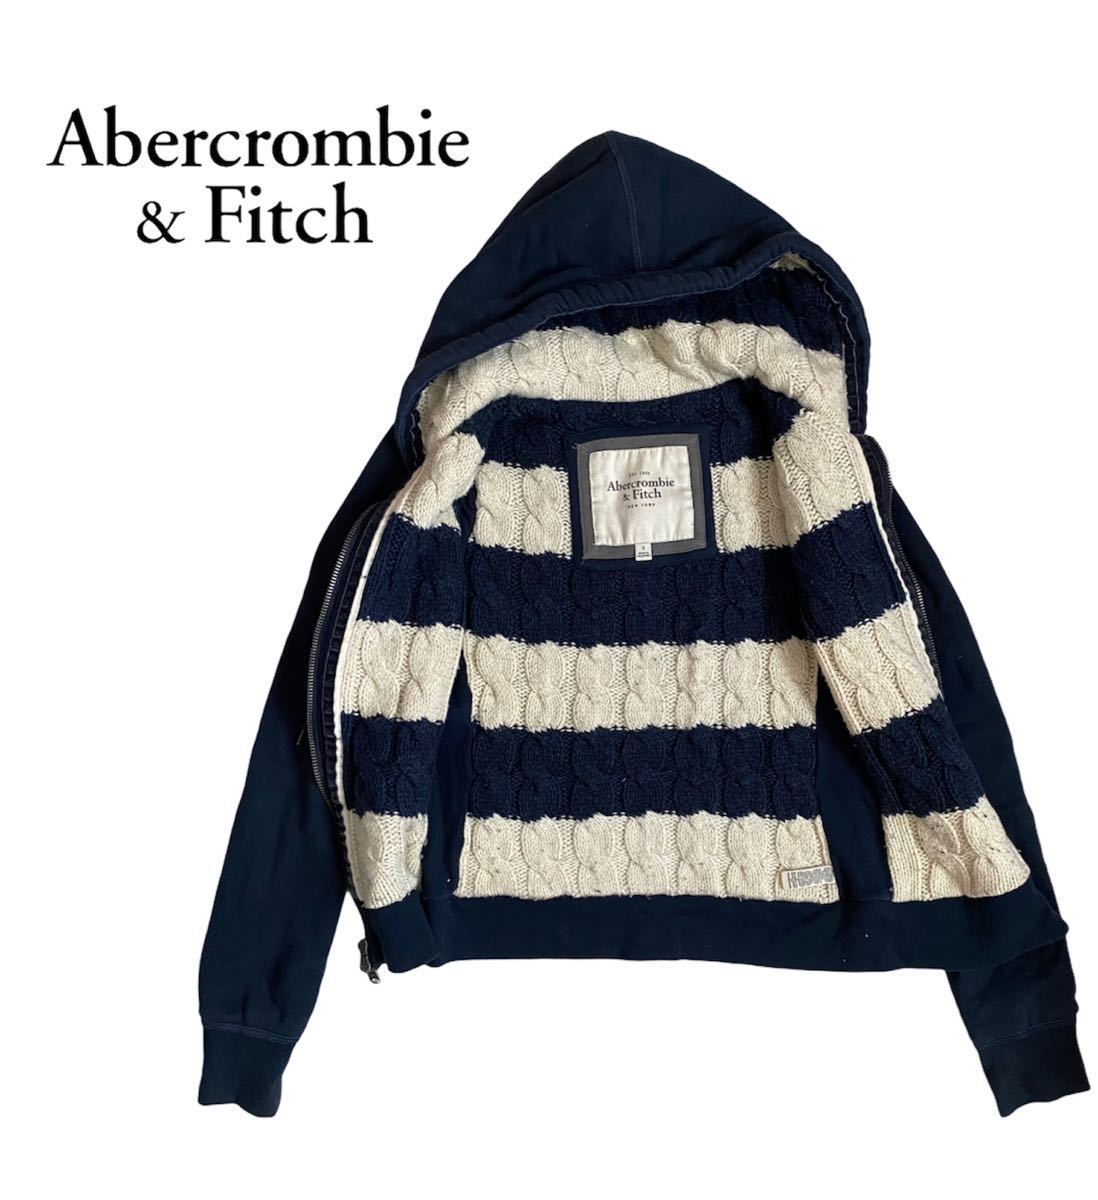 Abercrombie&Fitch パーカー ネイビー ボーダー